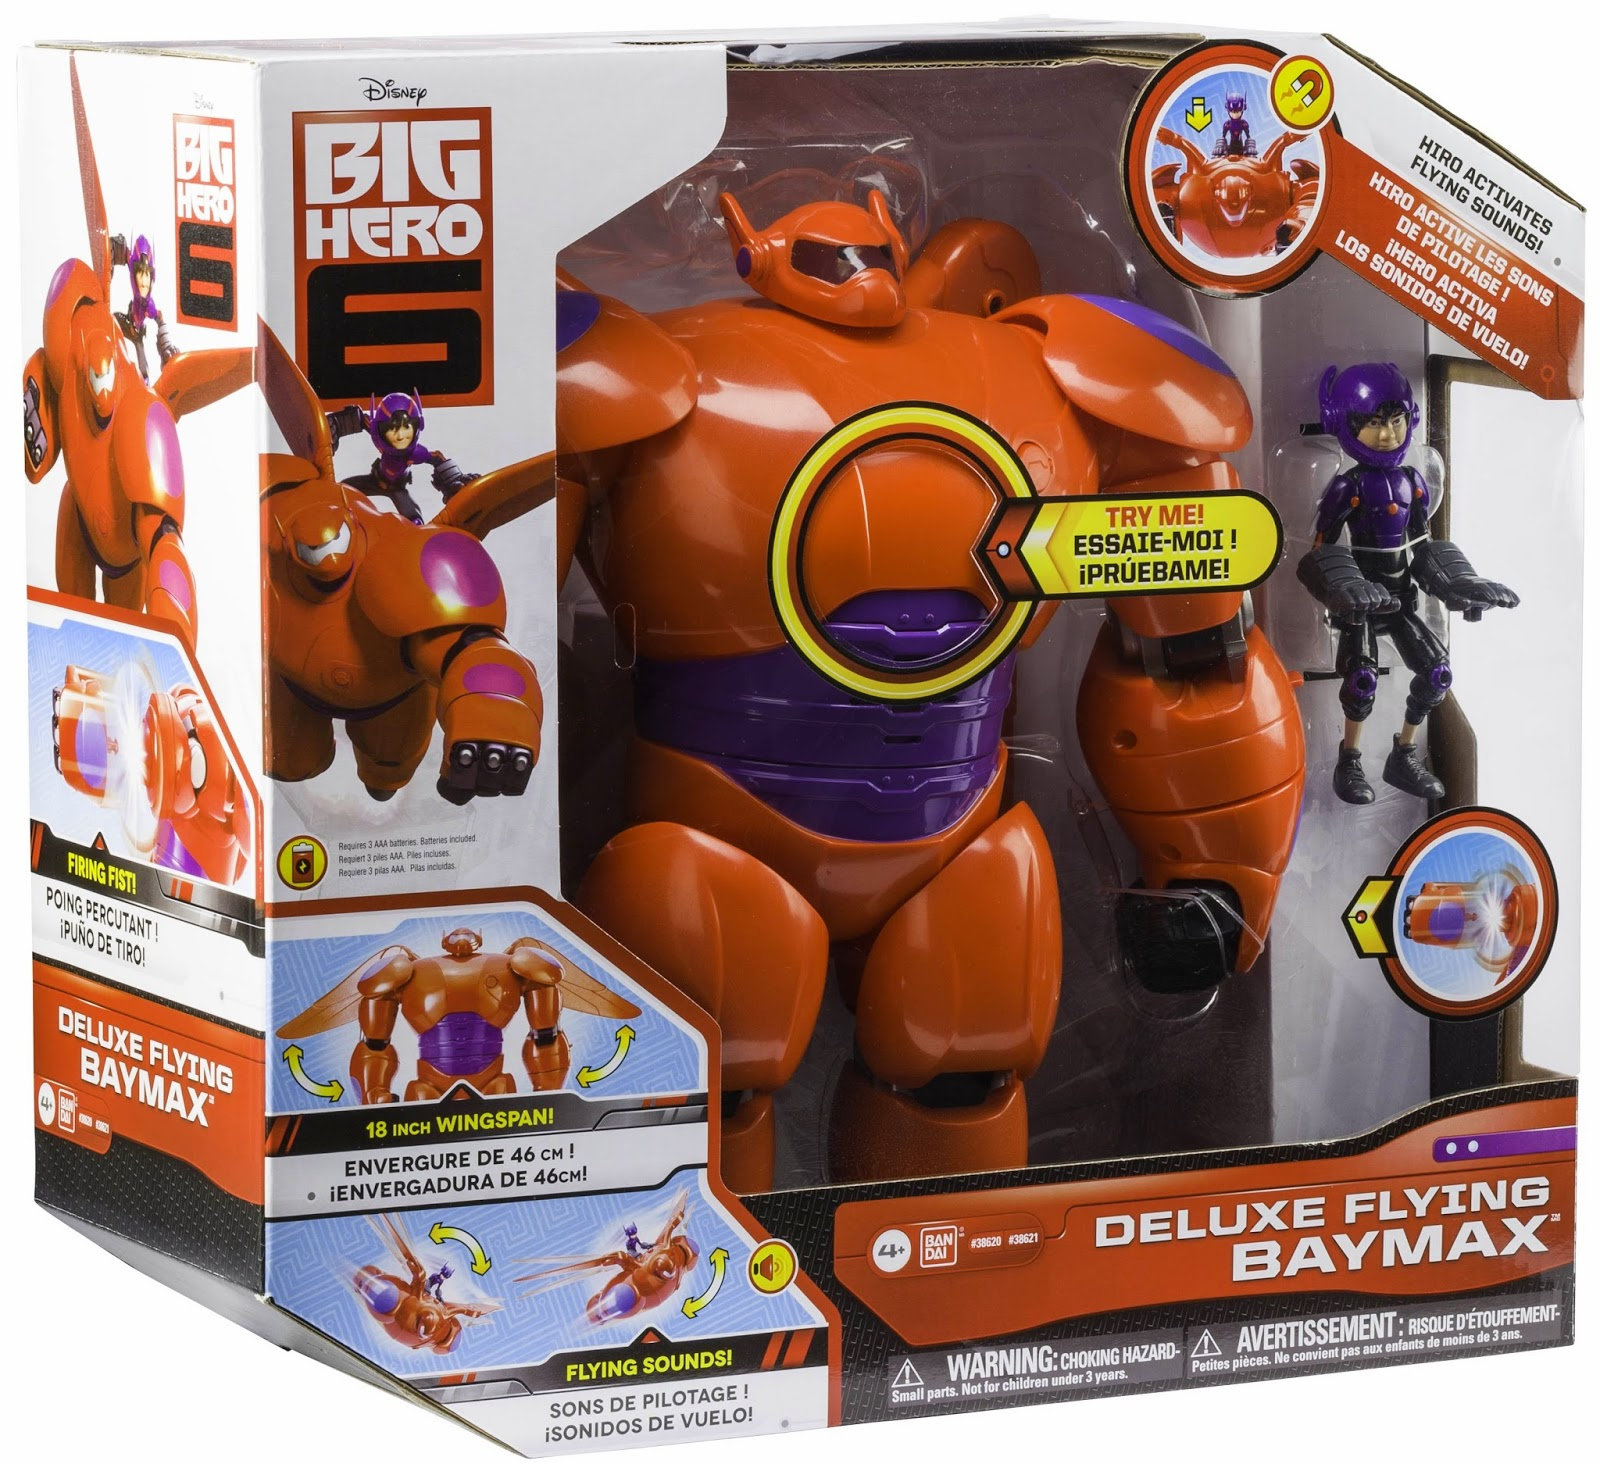 http://stacytilton.blogspot.com/2014/12/holiday-gift-guide-sprukits-big-hero-6.html